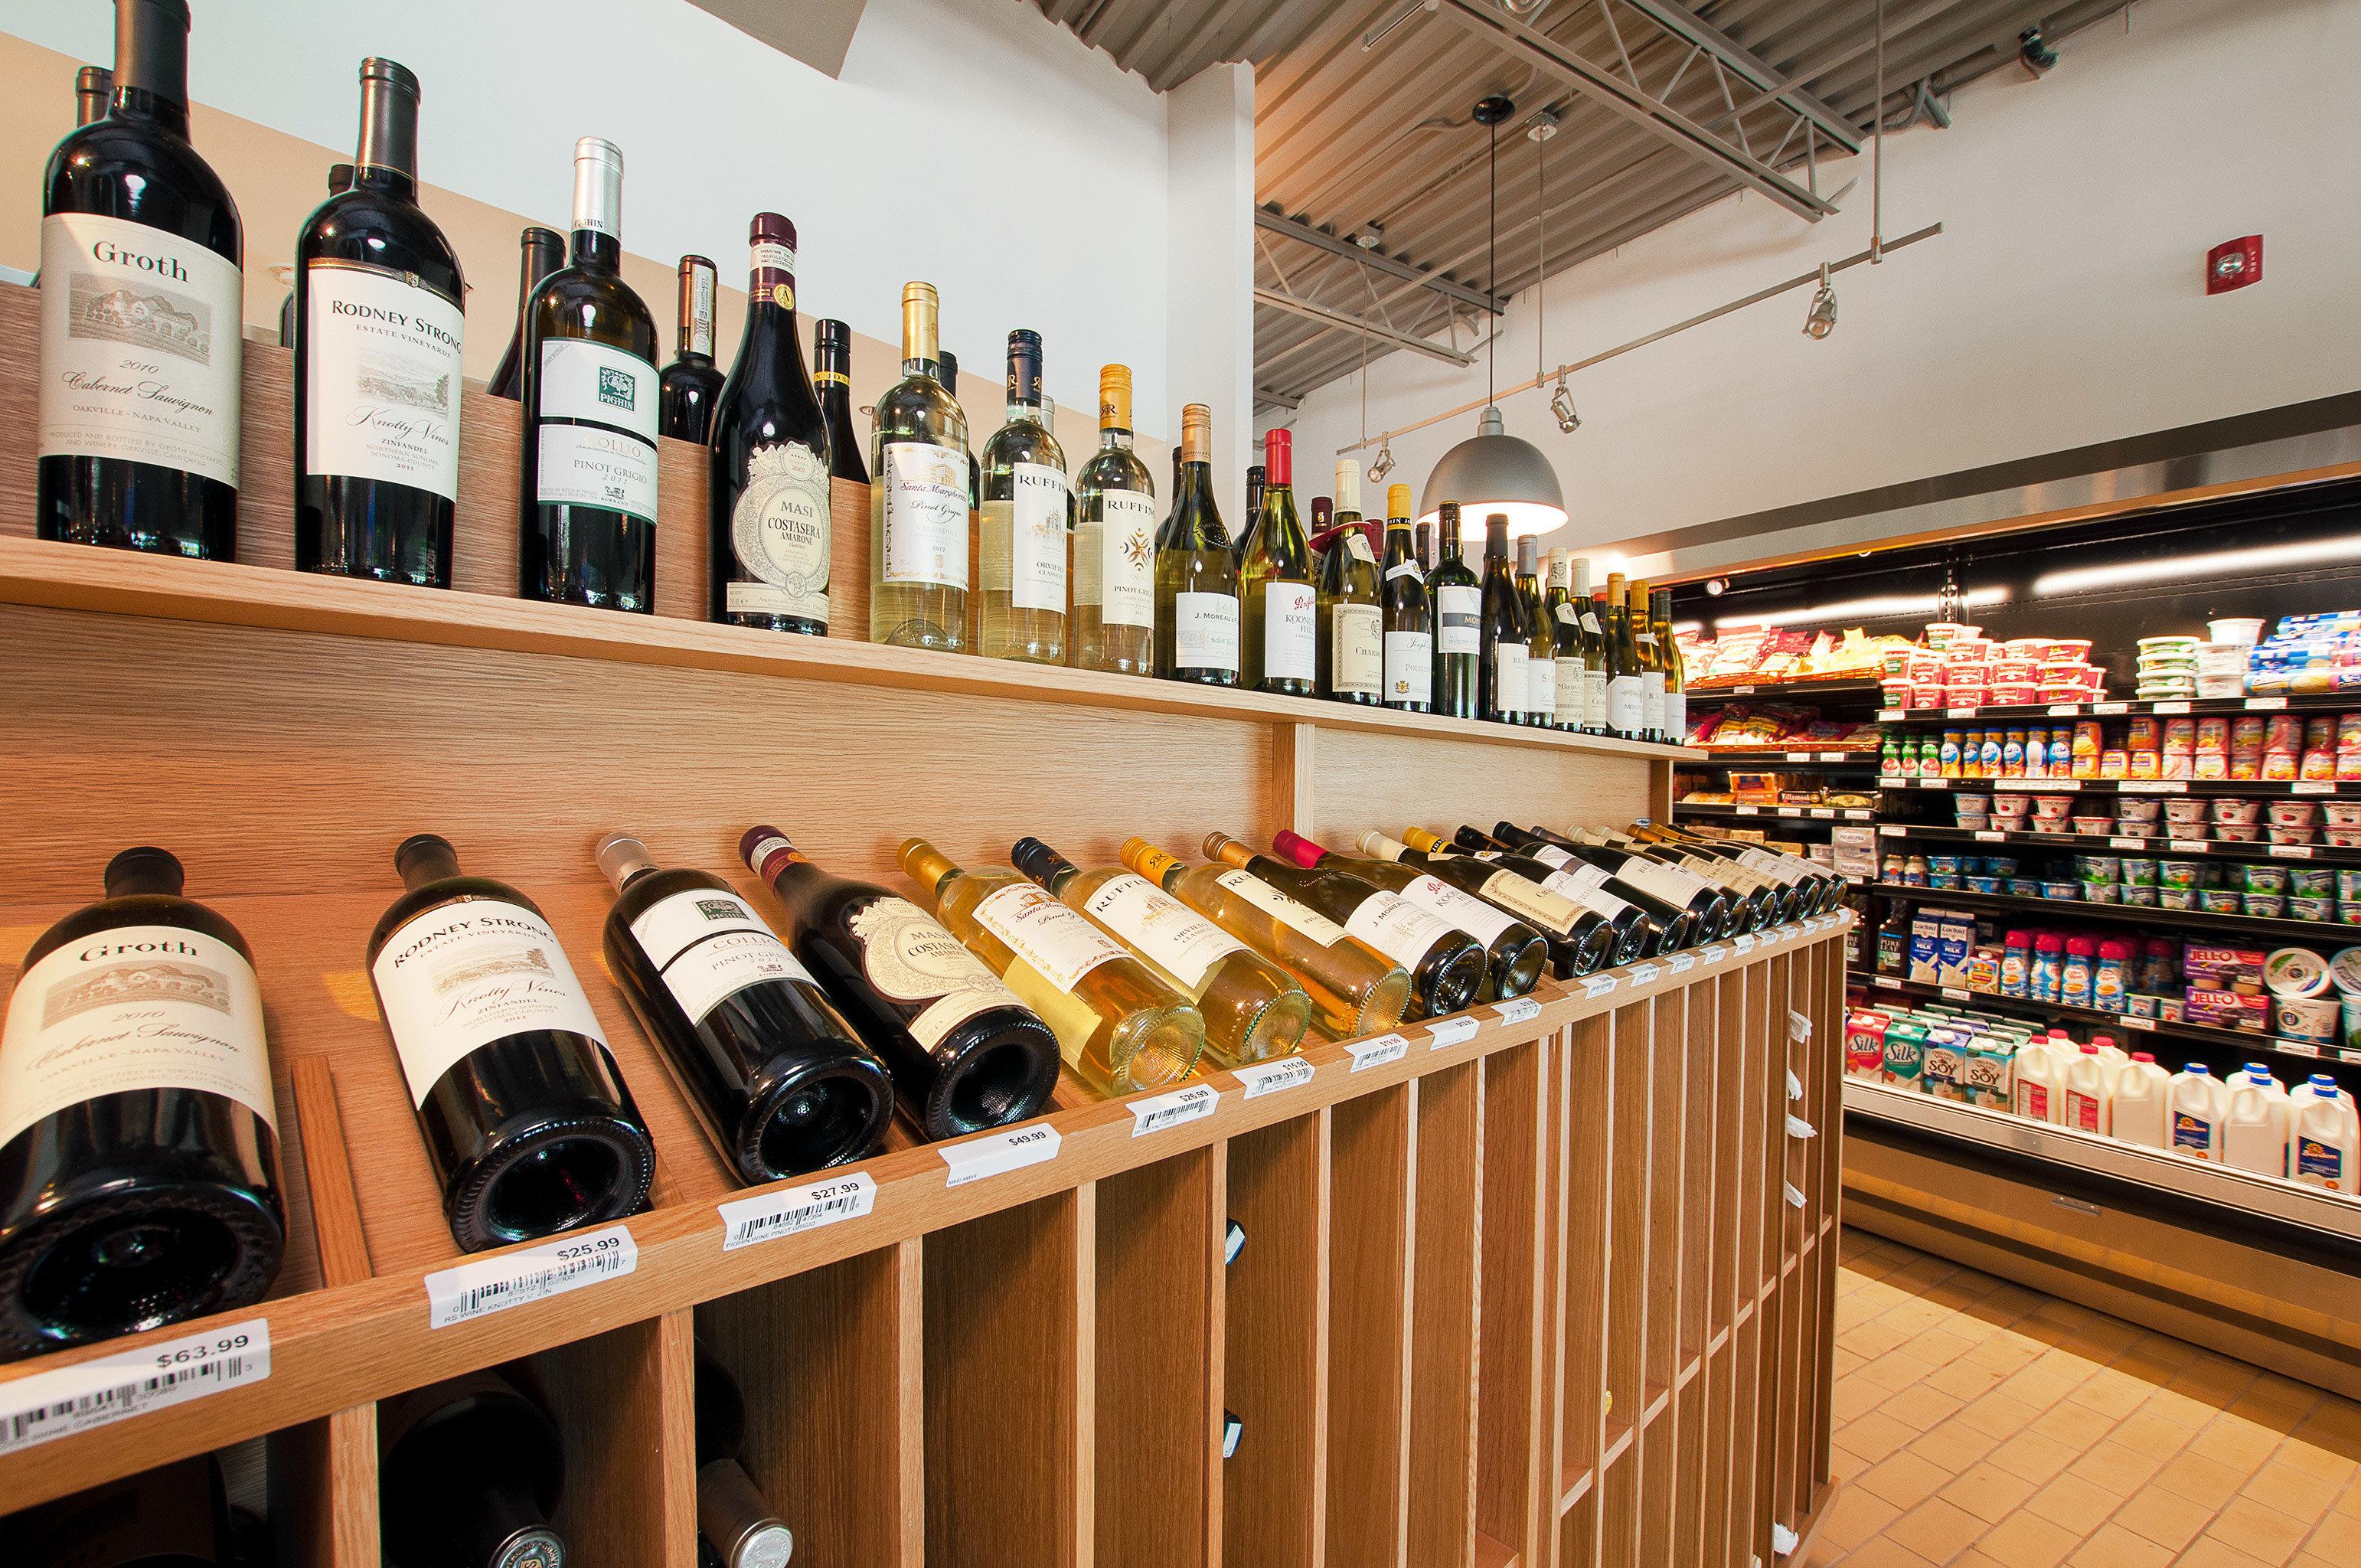 Cultural Drink Grounds Resort bottle wine Bar counter beer liquor store shelf grocery store drinking